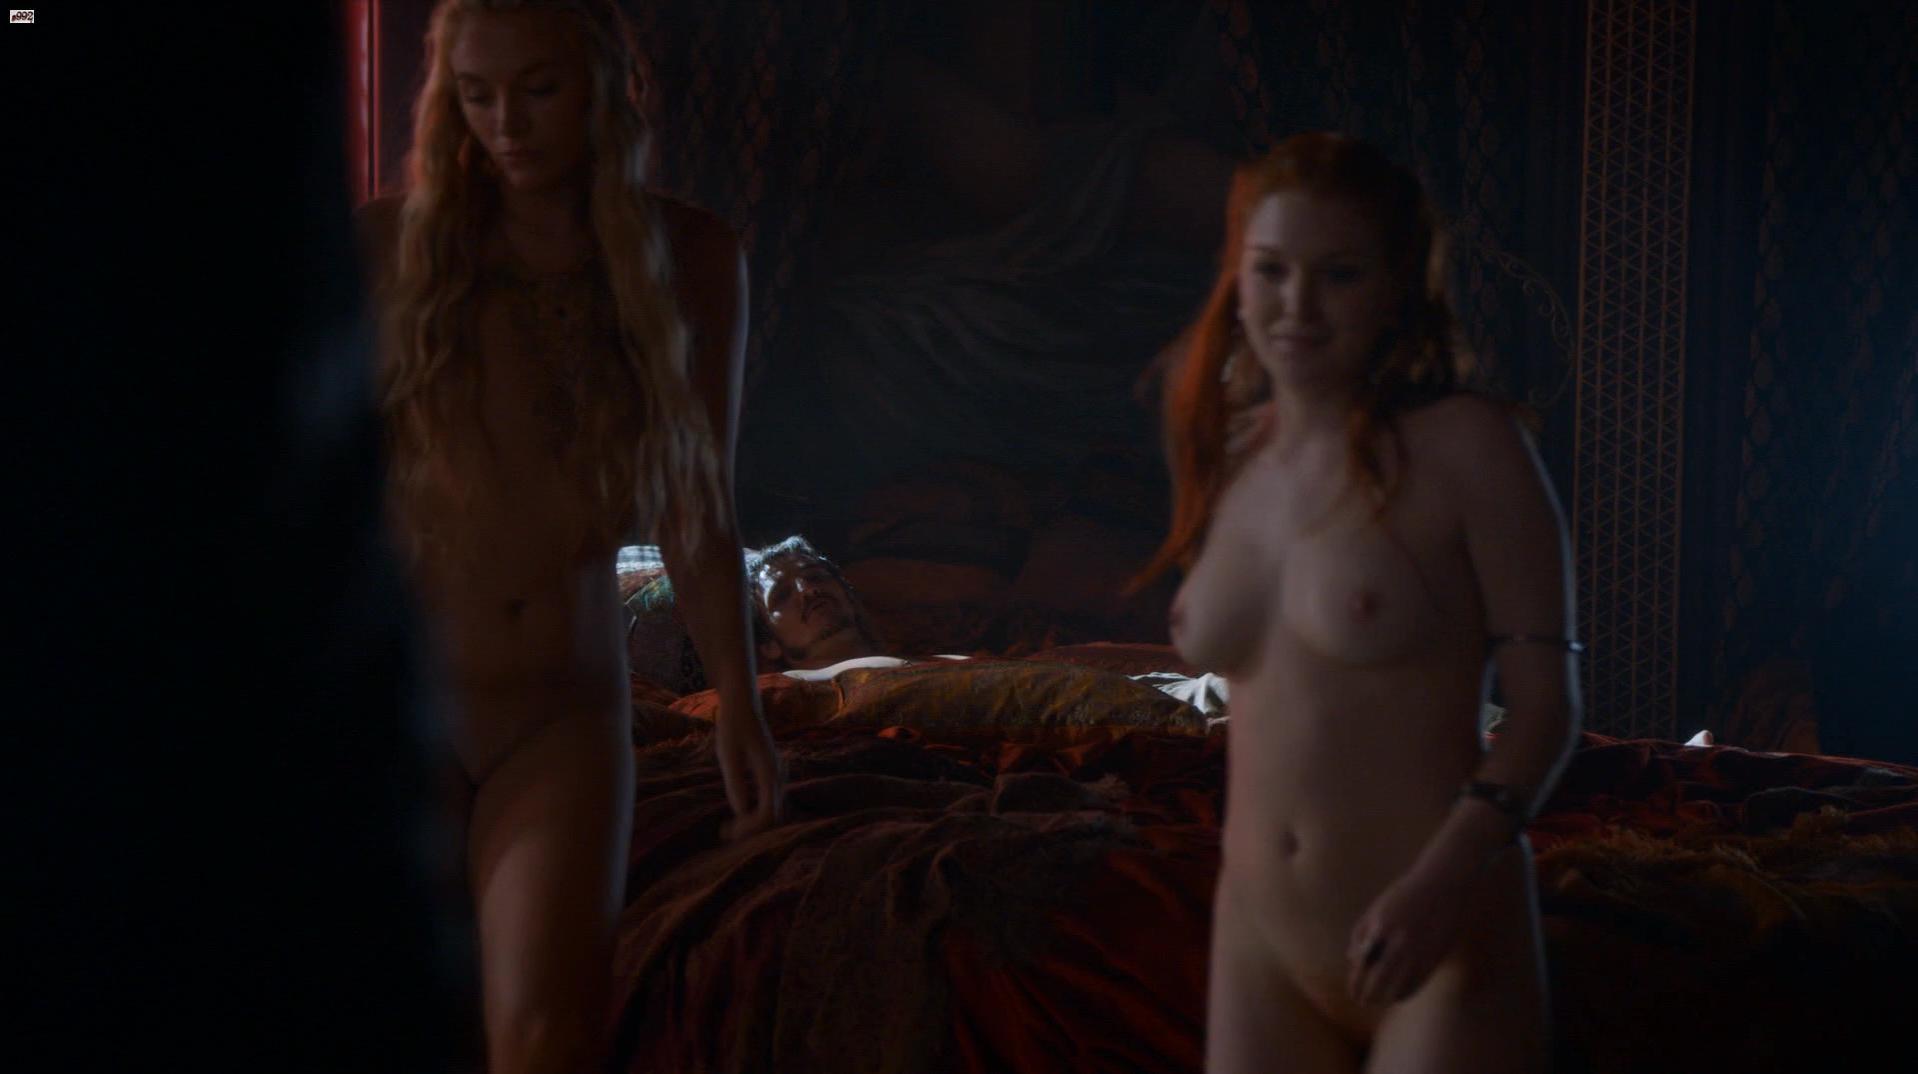 Josephine Gillan nude, Xena Avramidis nude - Game of Thrones s04e03 (2014)